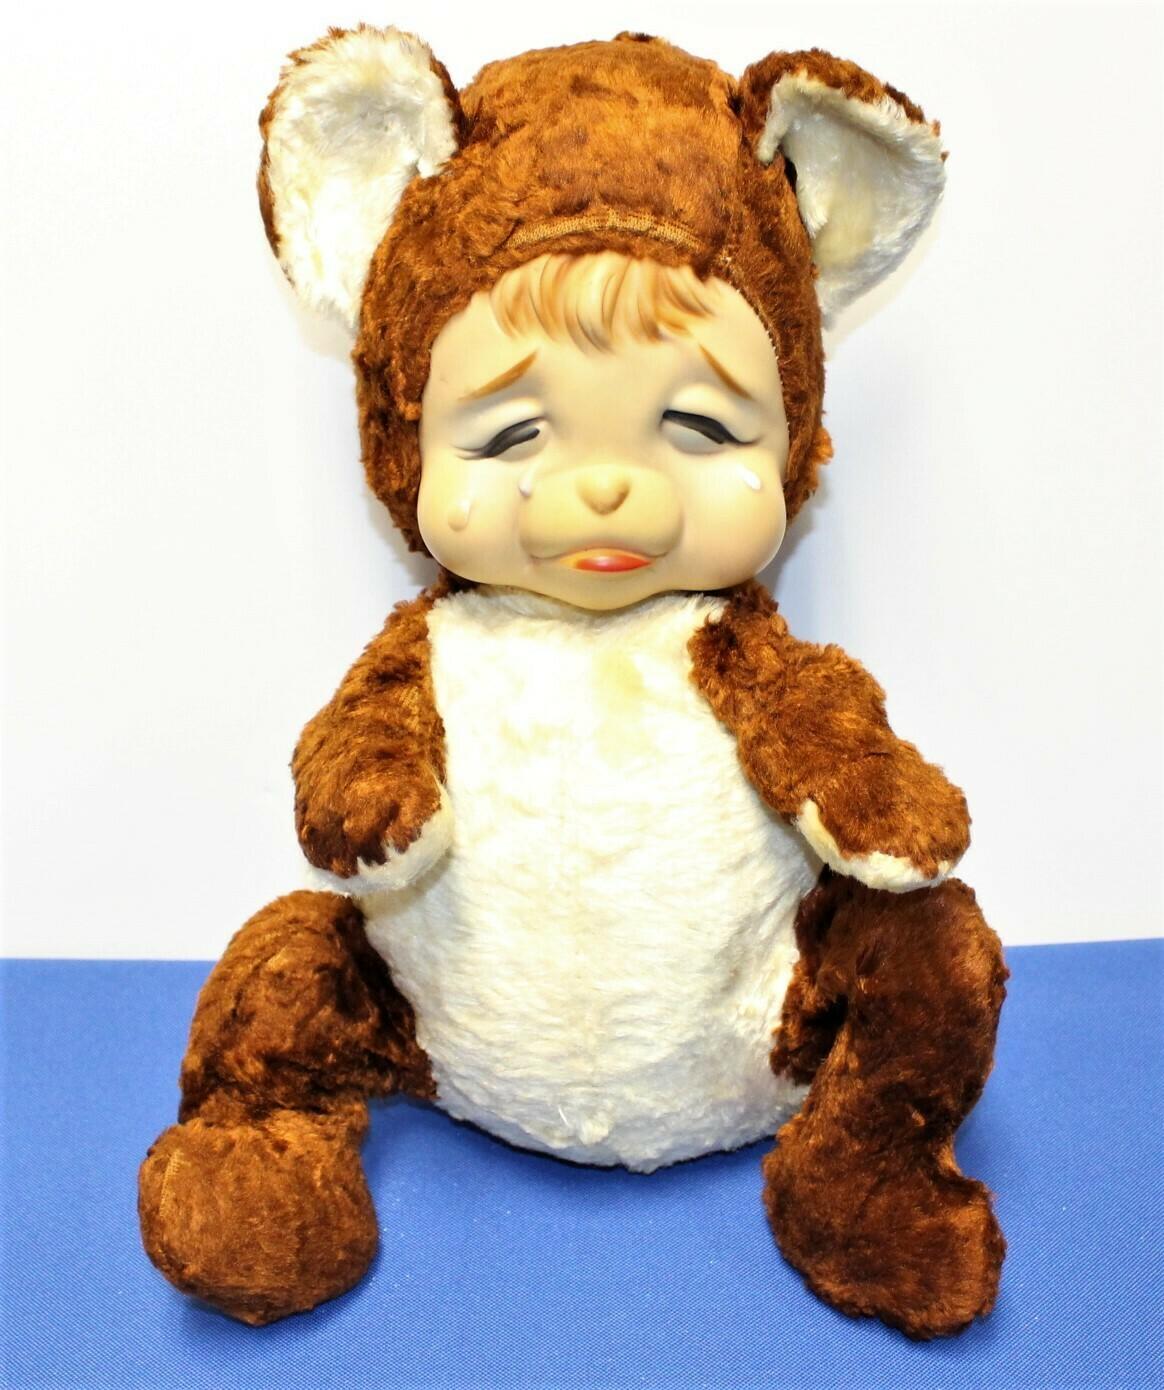 "Rushton Rubber Face Vintage Sad Crying Pouting 15"" Plush Teddy Bear, Rare!"